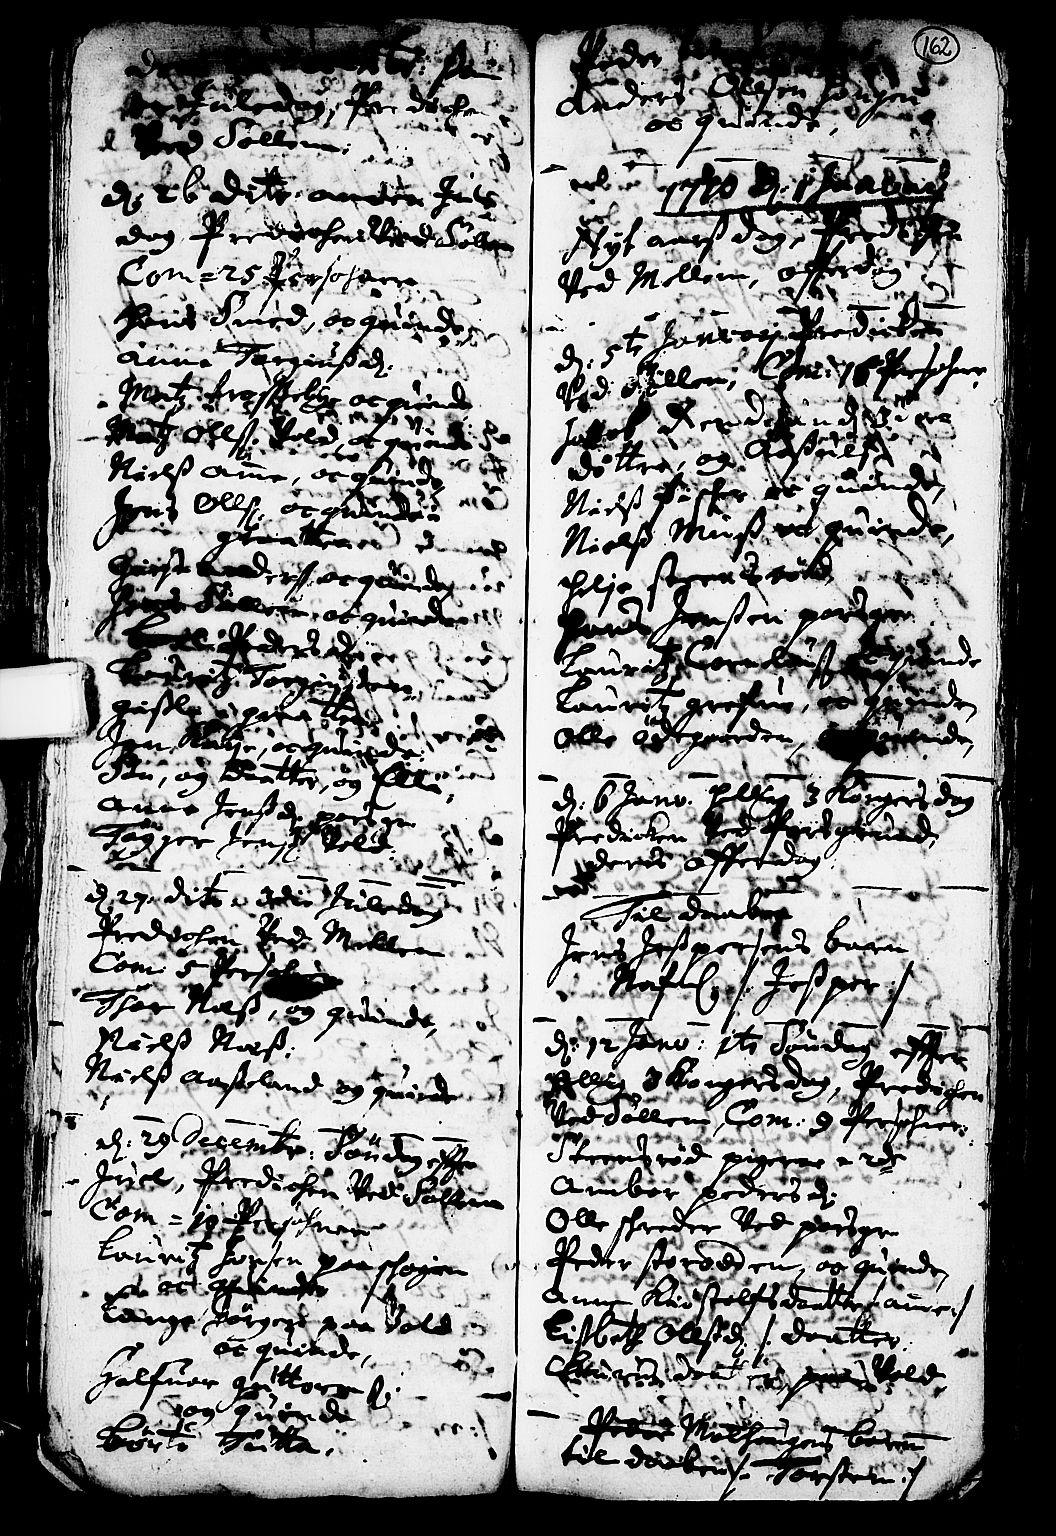 SAKO, Solum kirkebøker, F/Fa/L0001: Ministerialbok nr. I 1, 1701-1716, s. 162